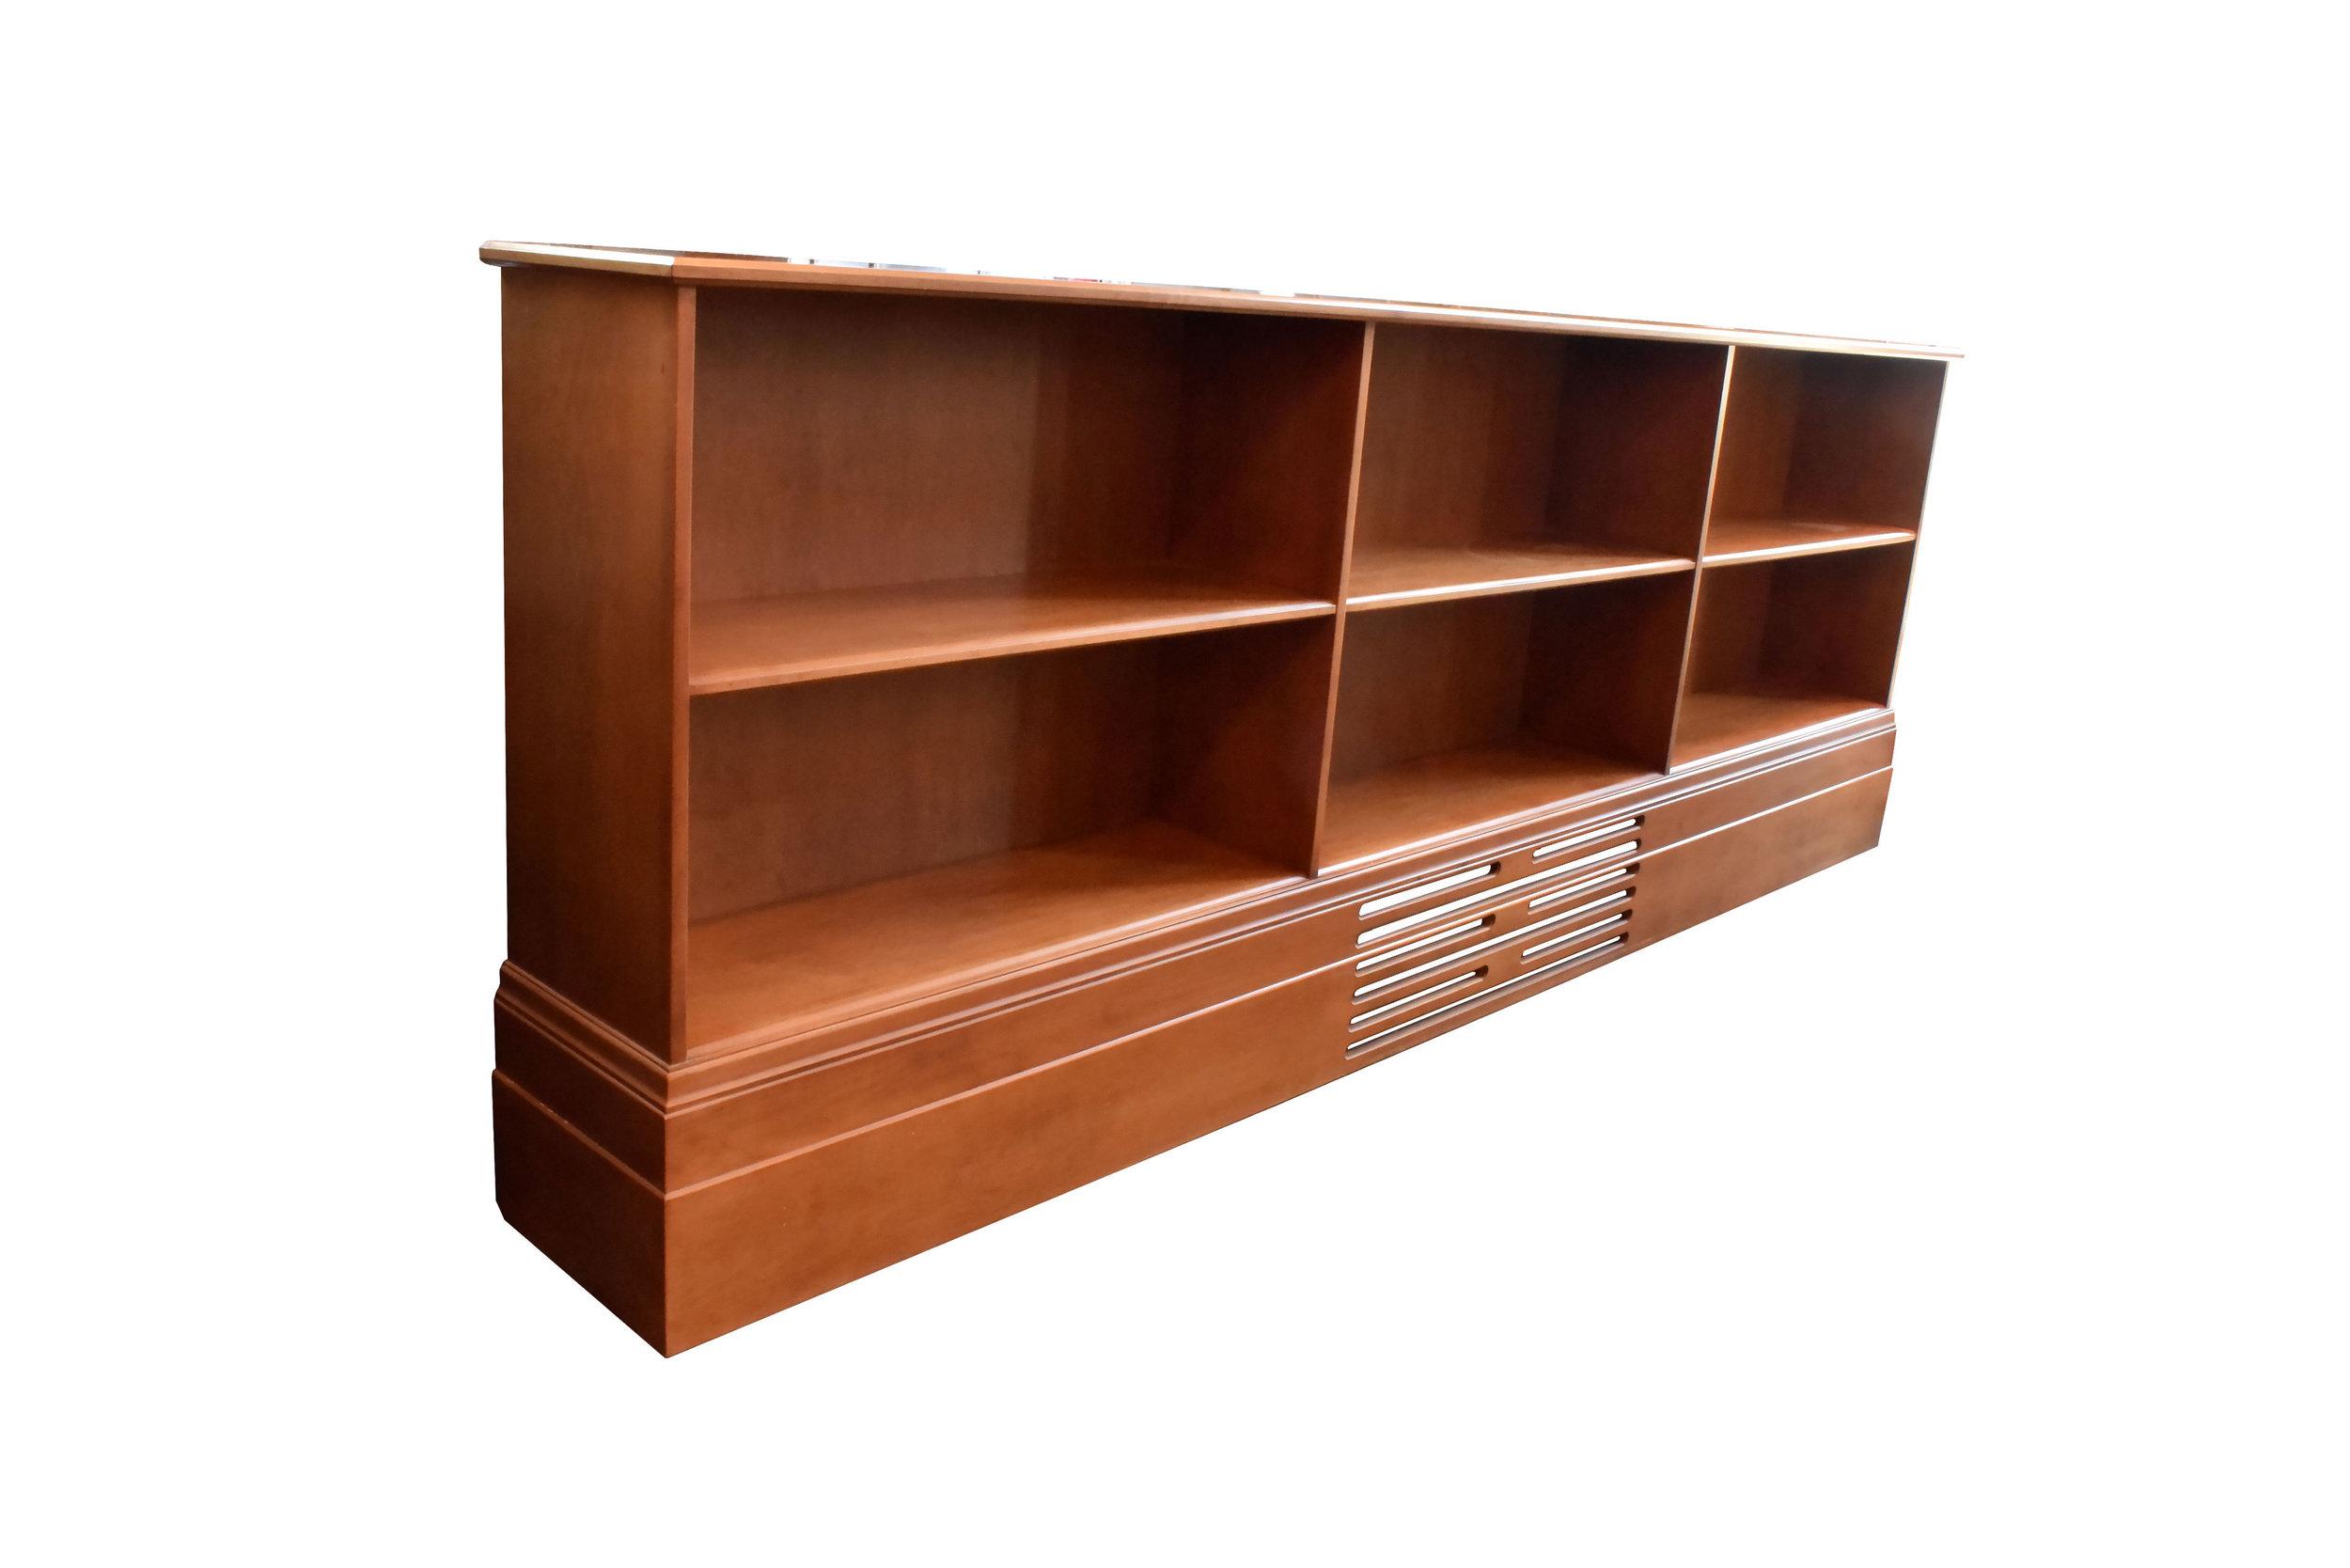 47103-walnut-bookcase-angle-view.jpg